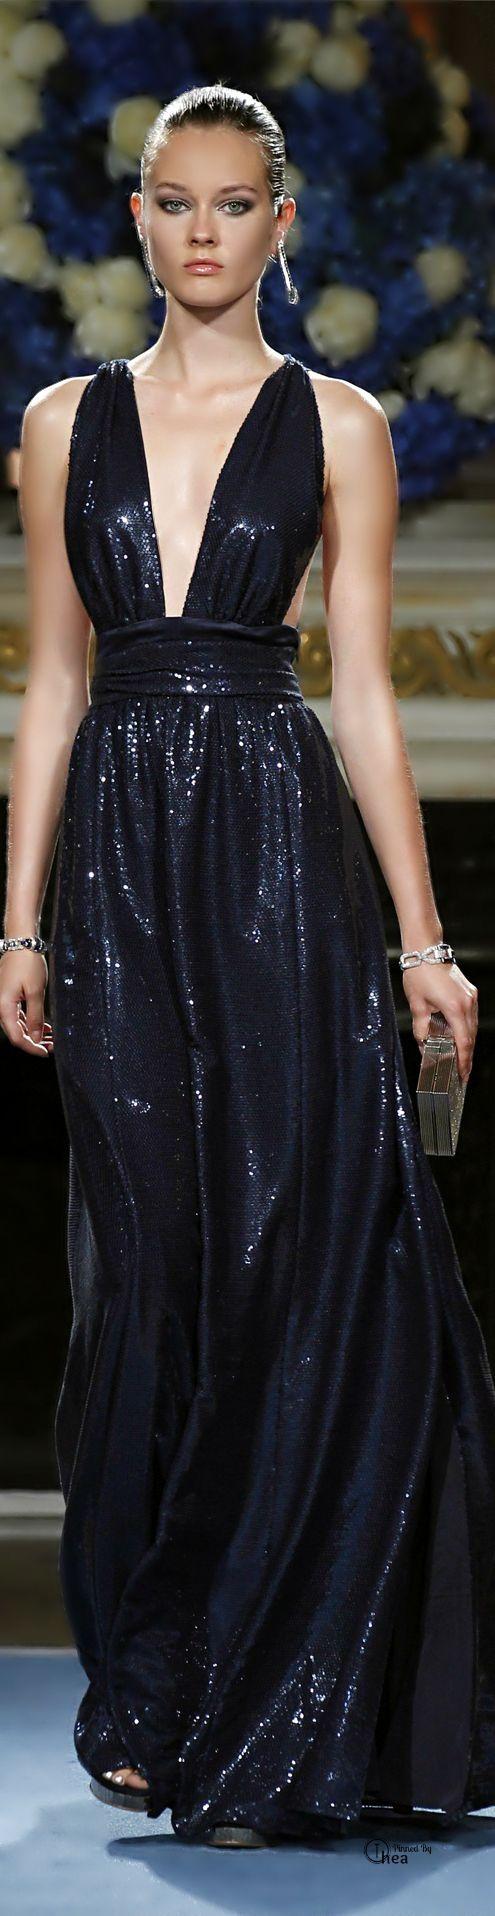 Sequin long dress black lemondedeladyka fashion